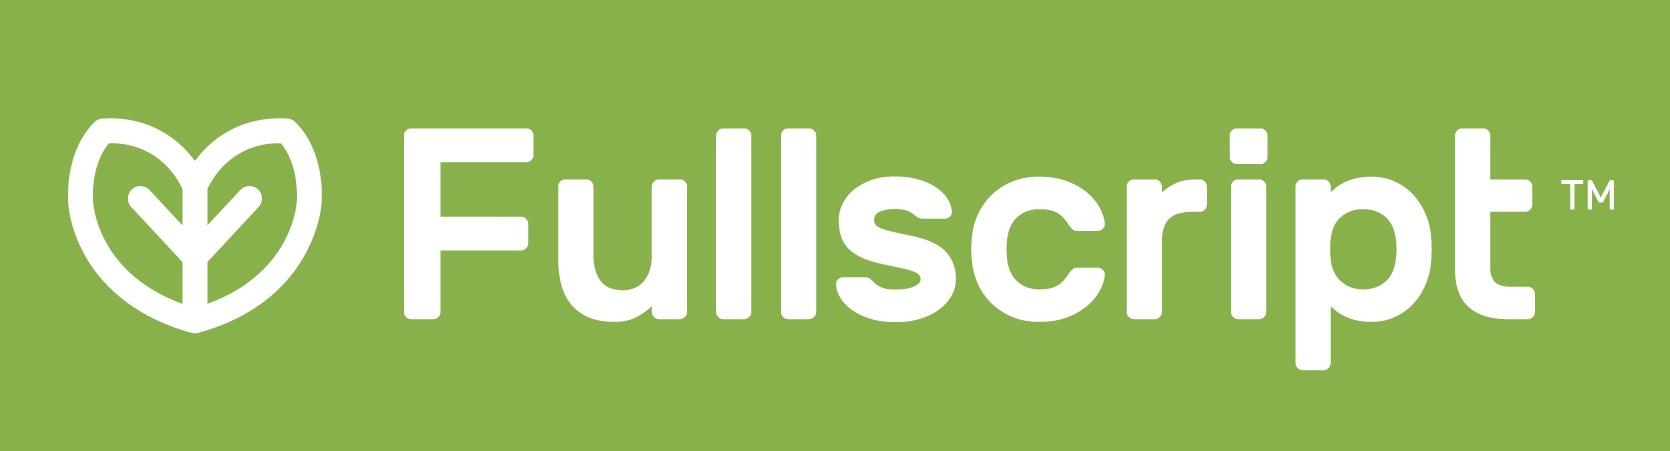 fullscript-logo-greenery-bg.jpg